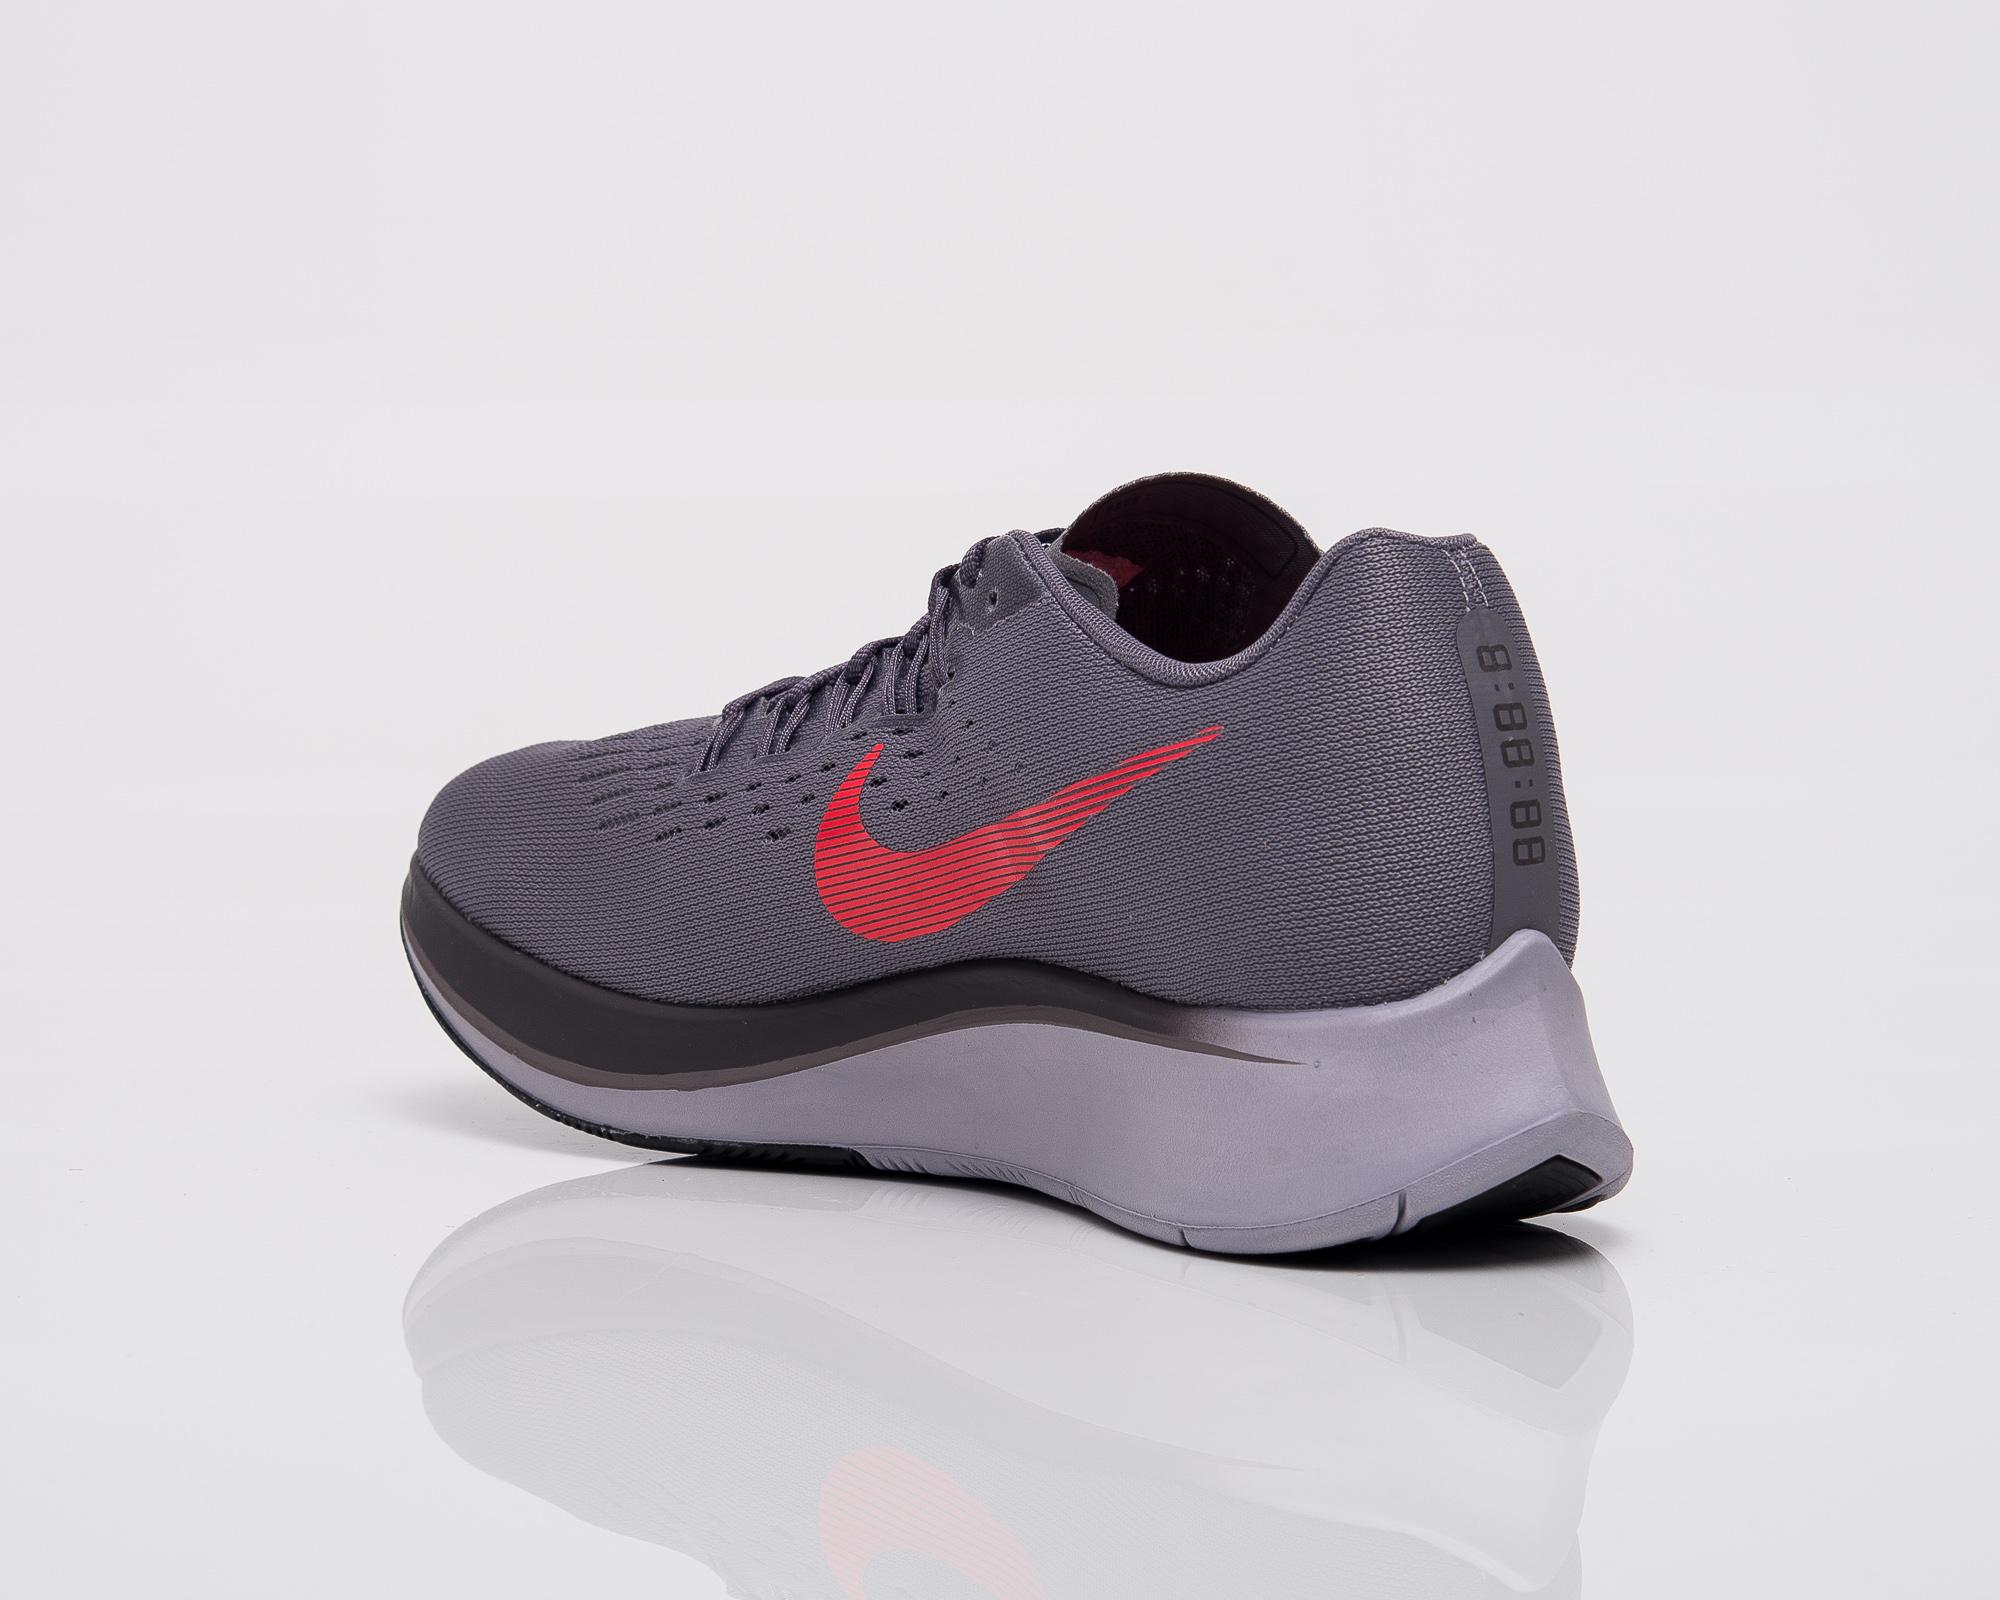 Mens Shoe Carrier